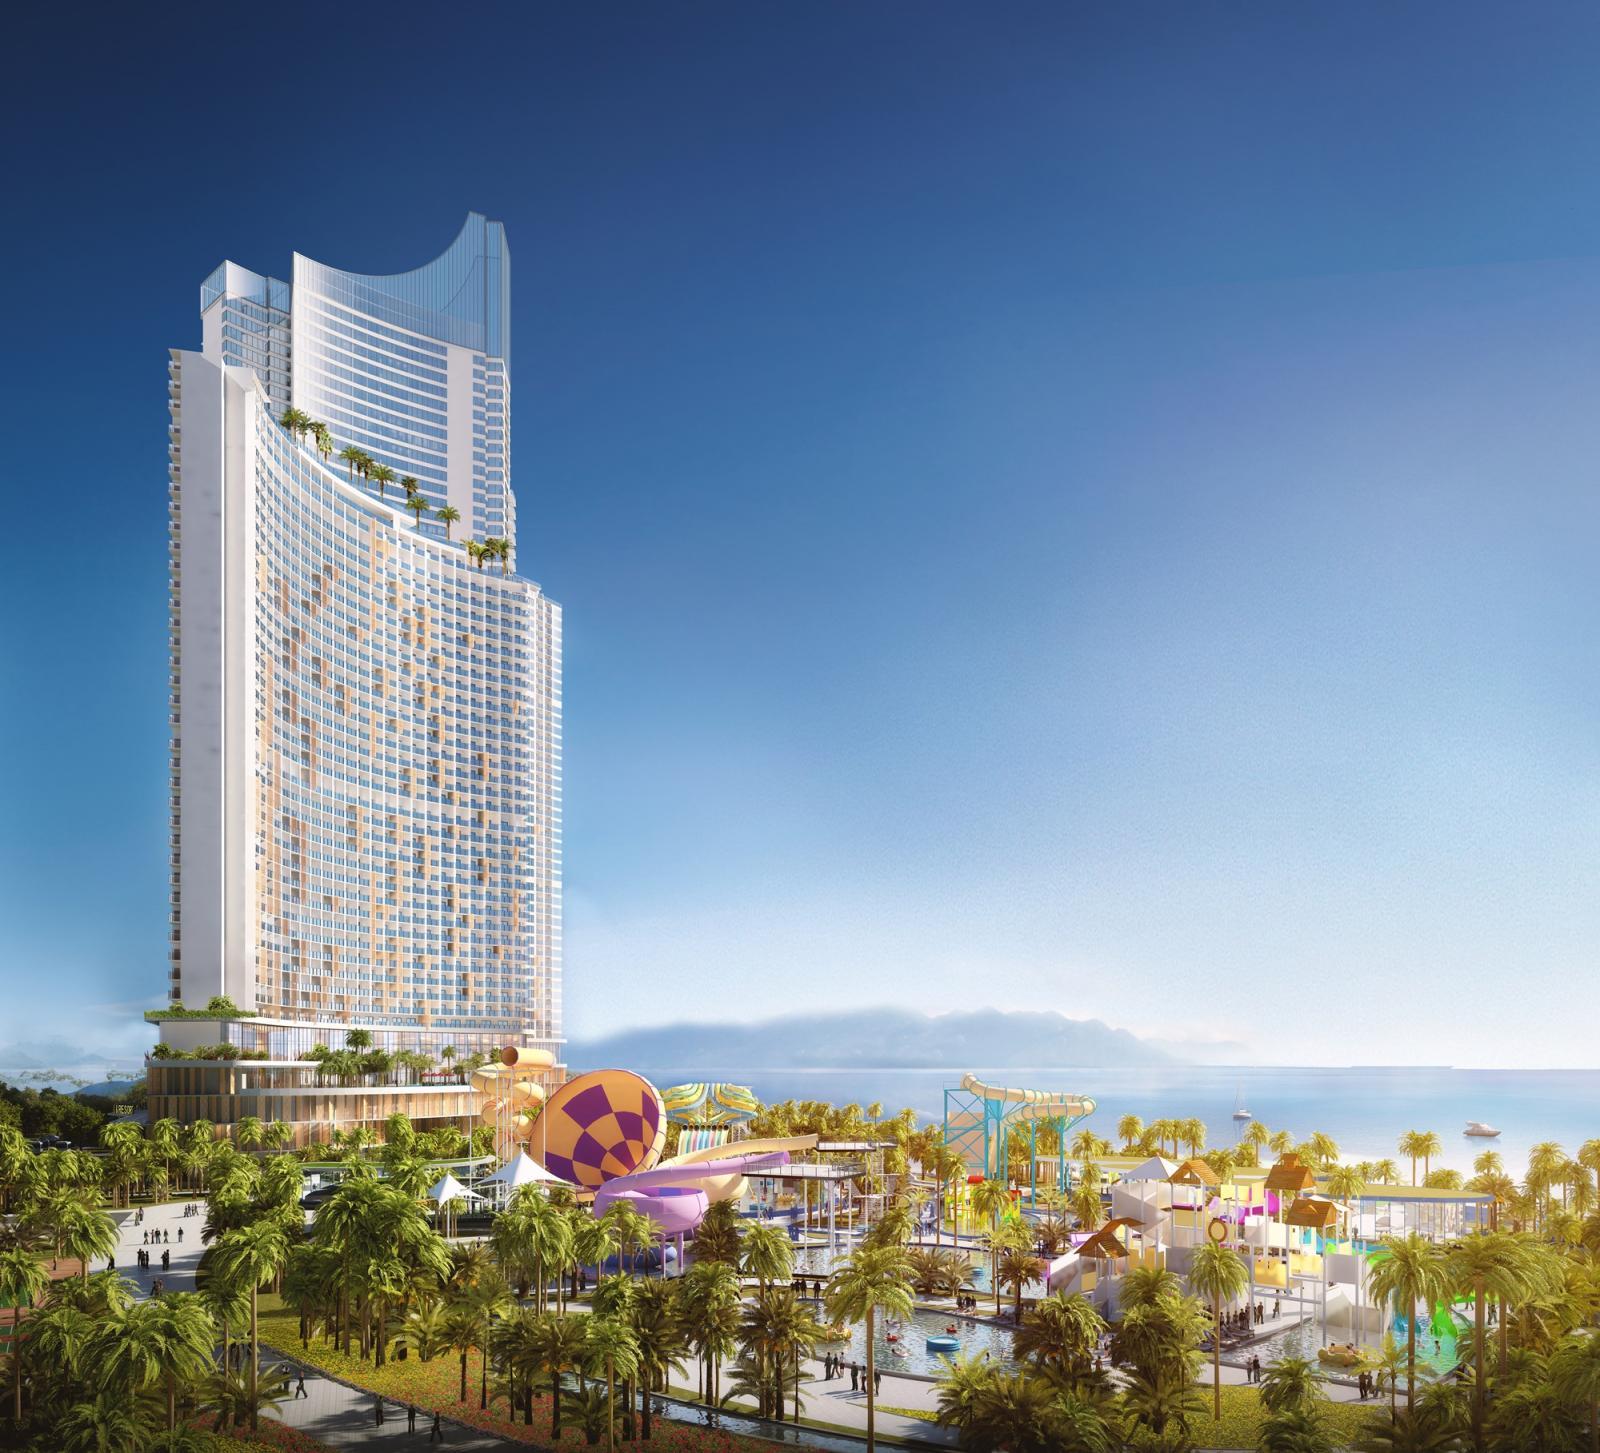 cam kết đầu tư SunBay Park Hotel & Resort Phan Rang